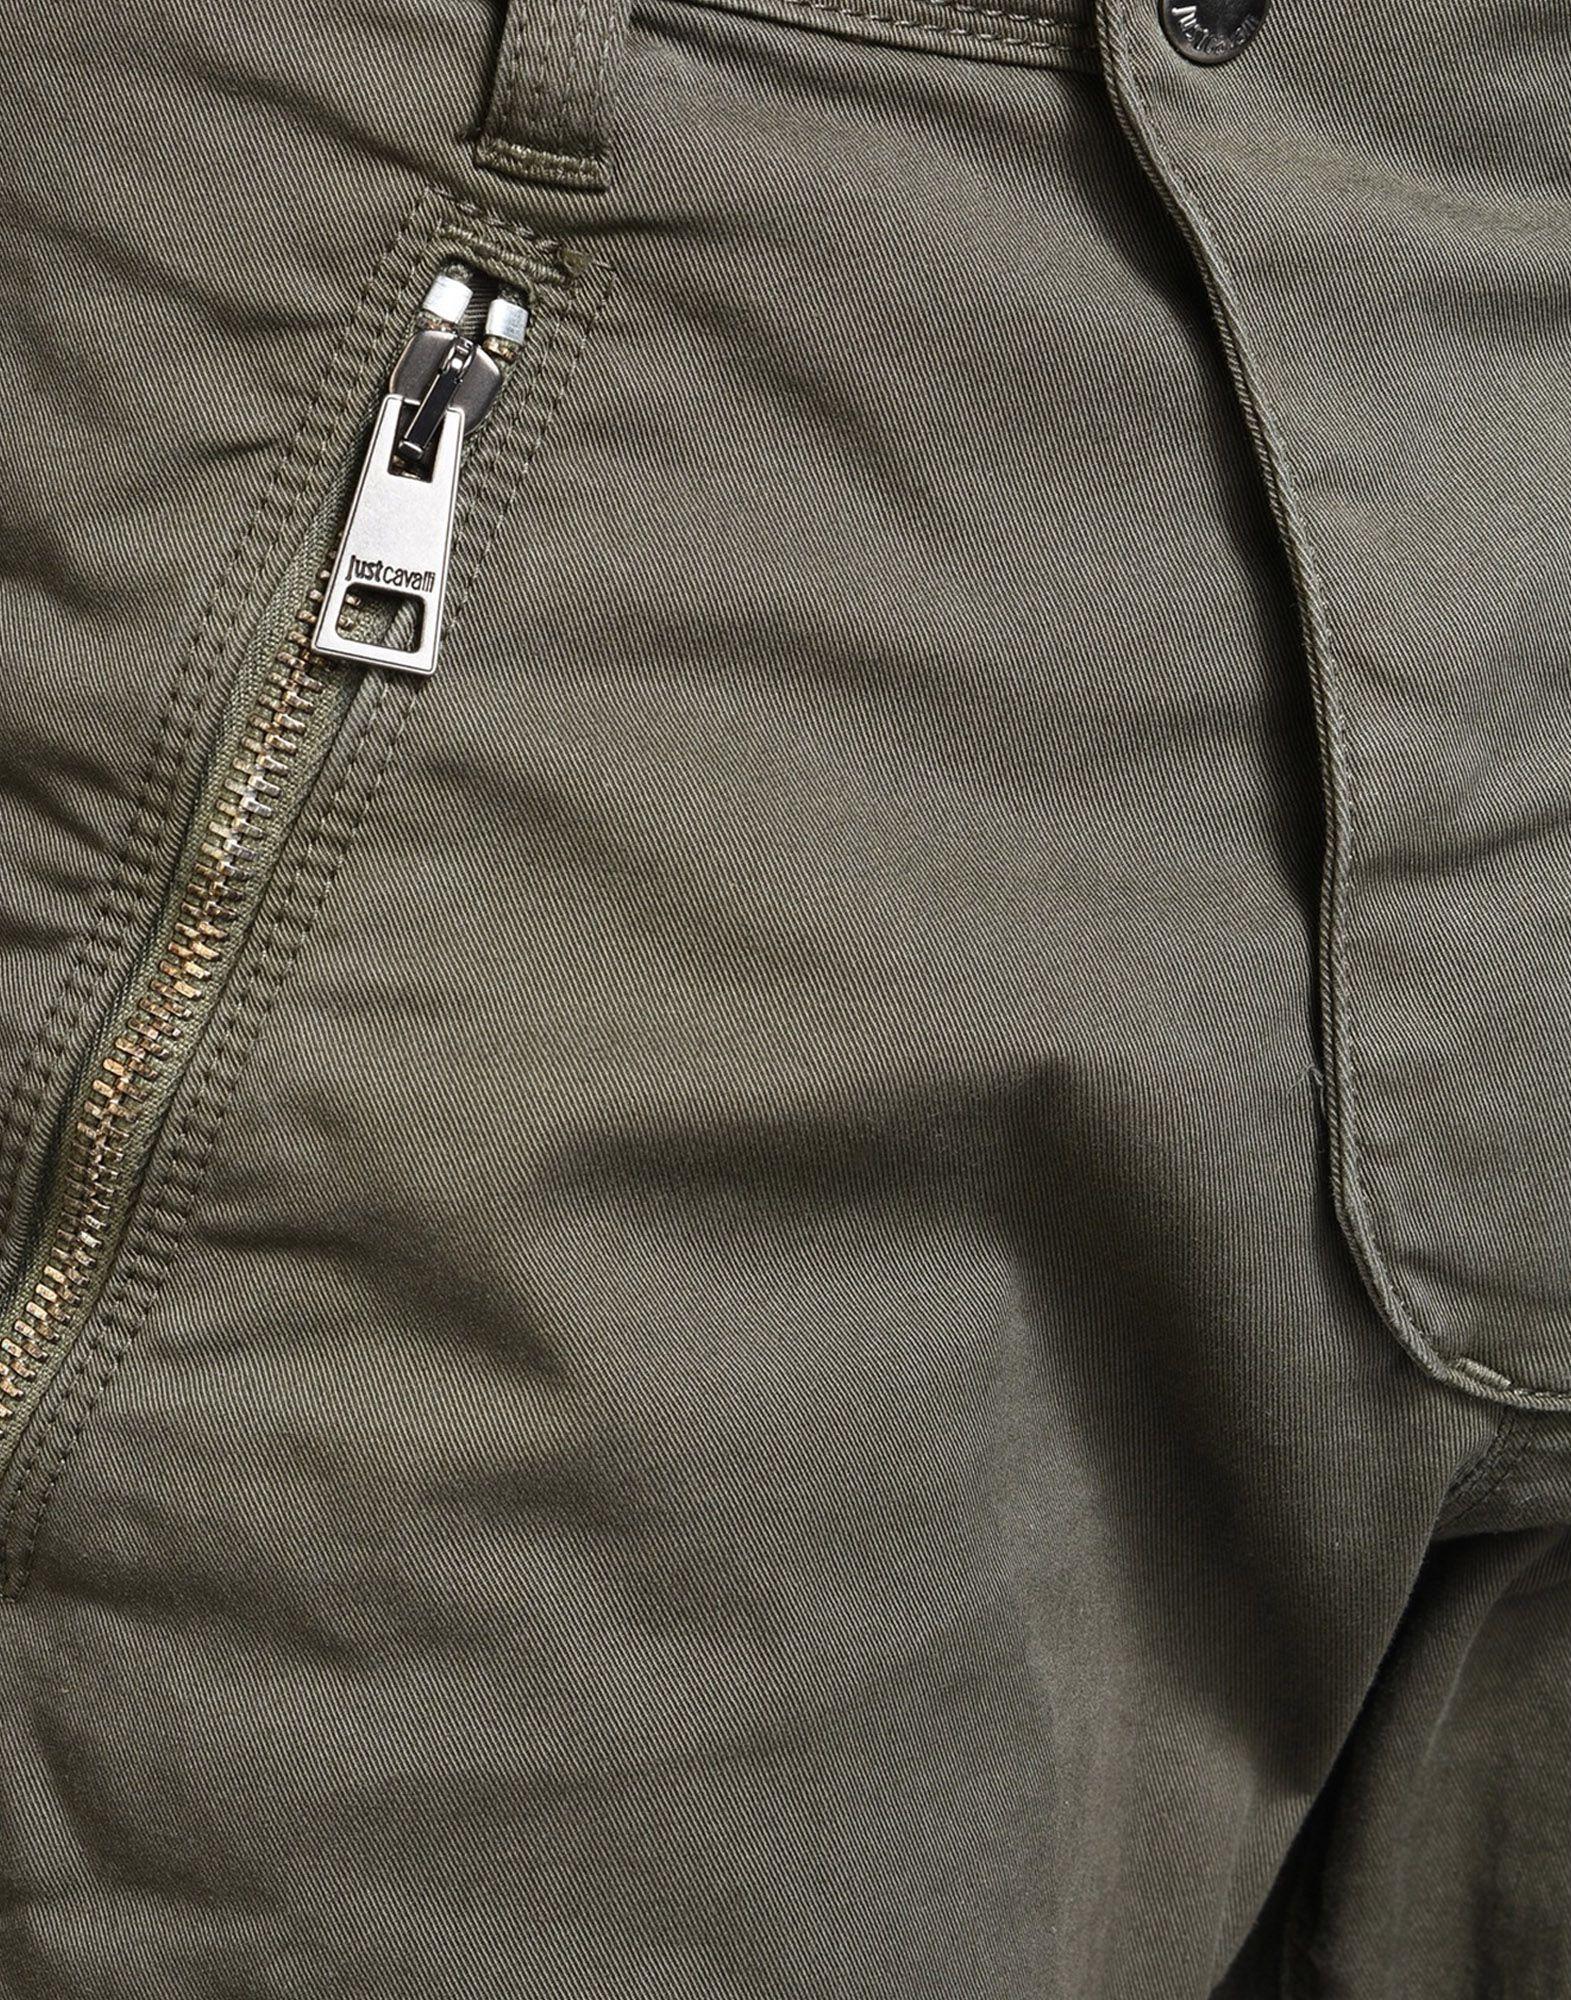 Pantalone Pantalone Pantalone Just Cavalli Uomo - 13136822WP 50fd58